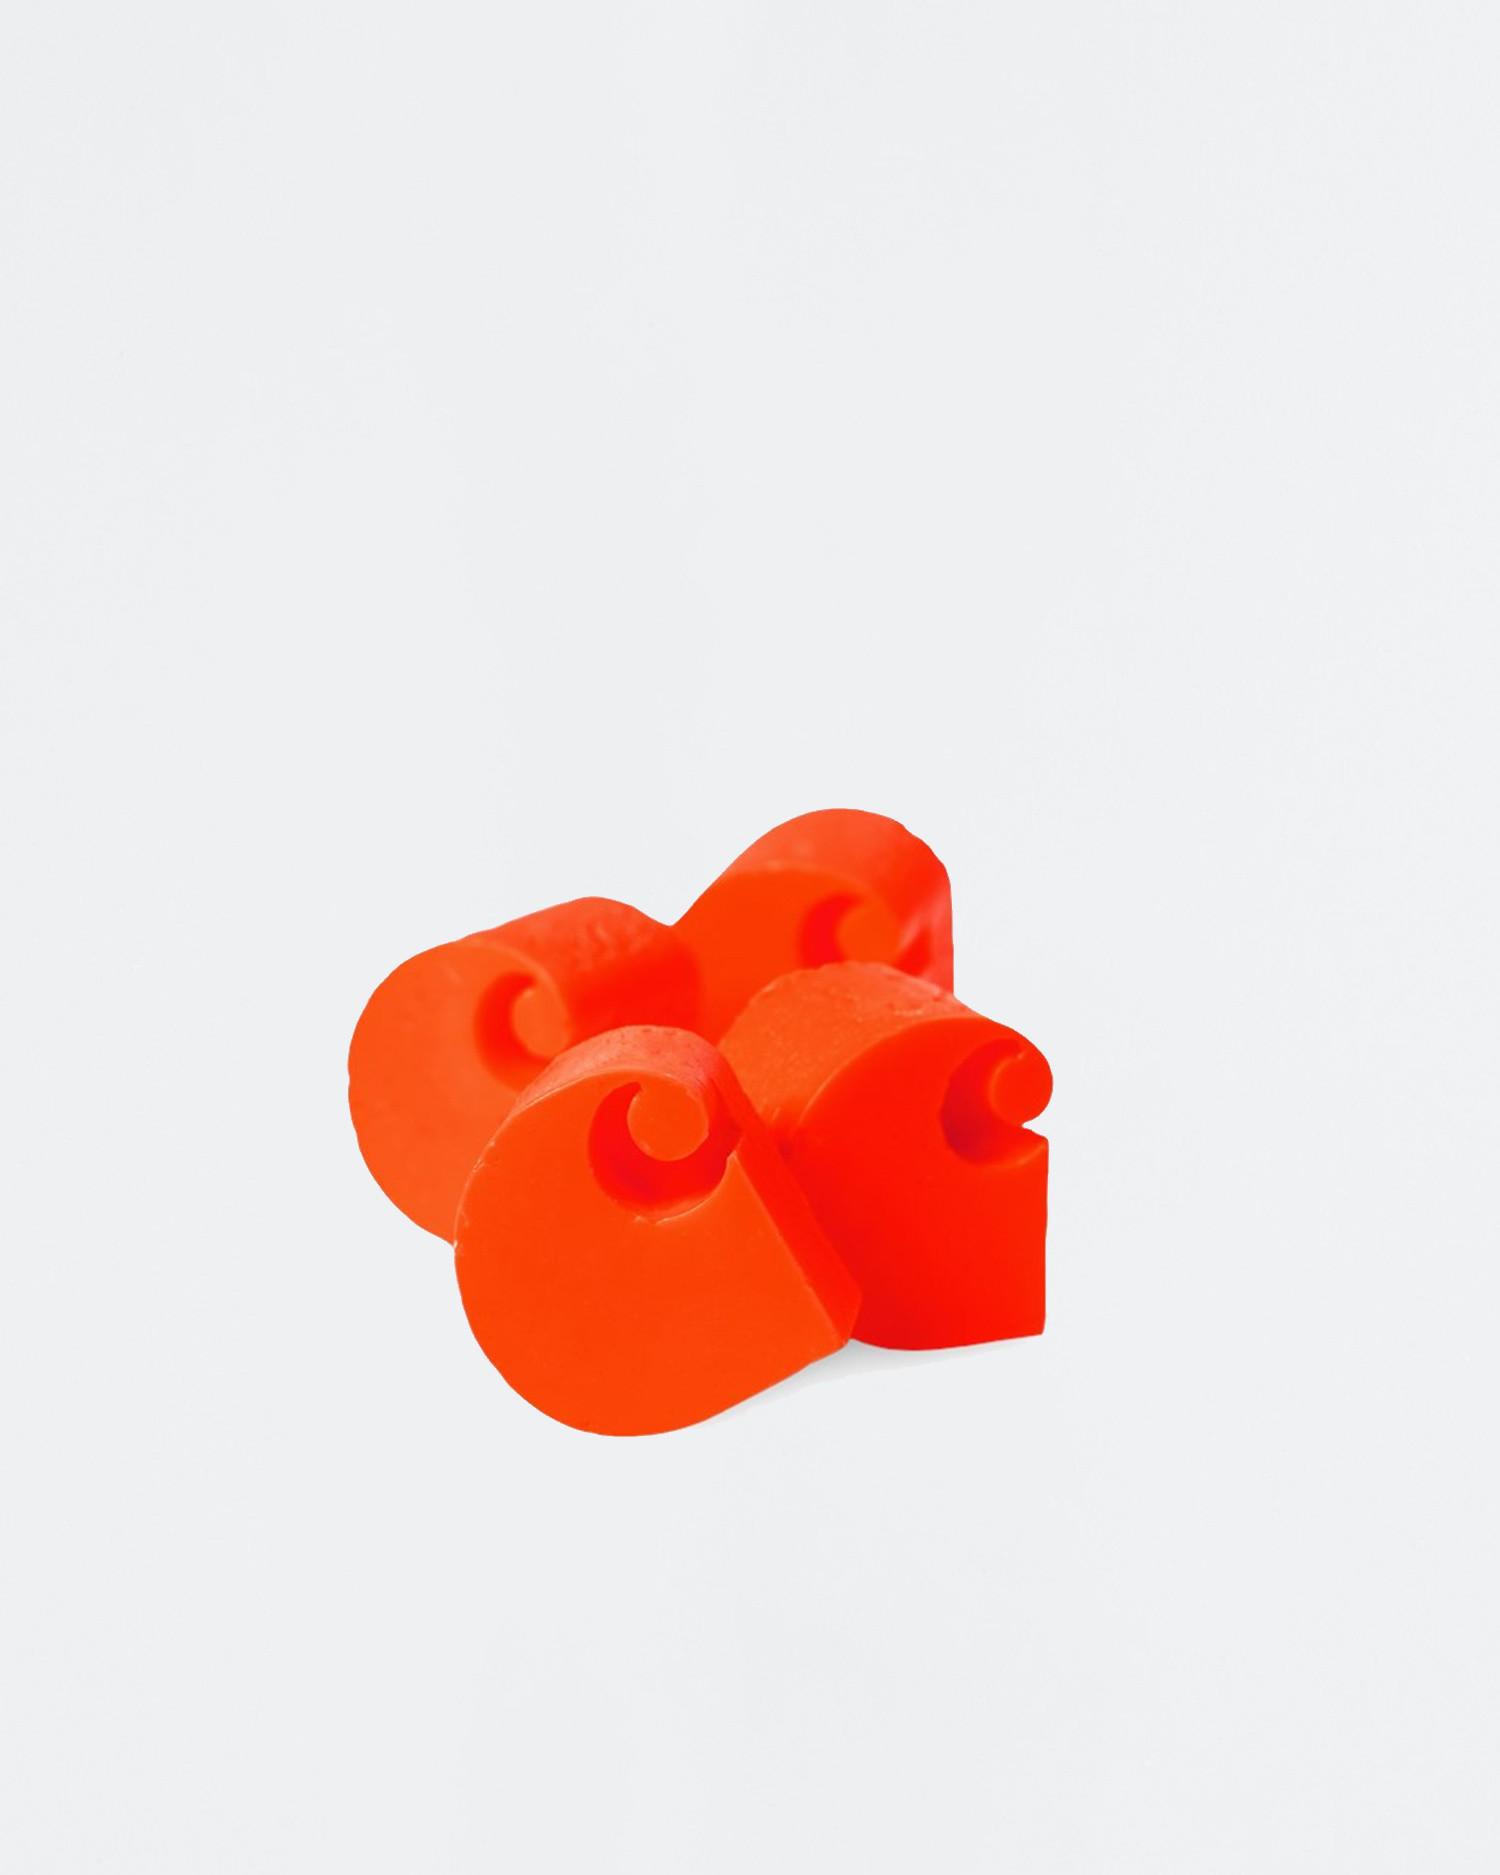 Carhartt Skate Wax Orange